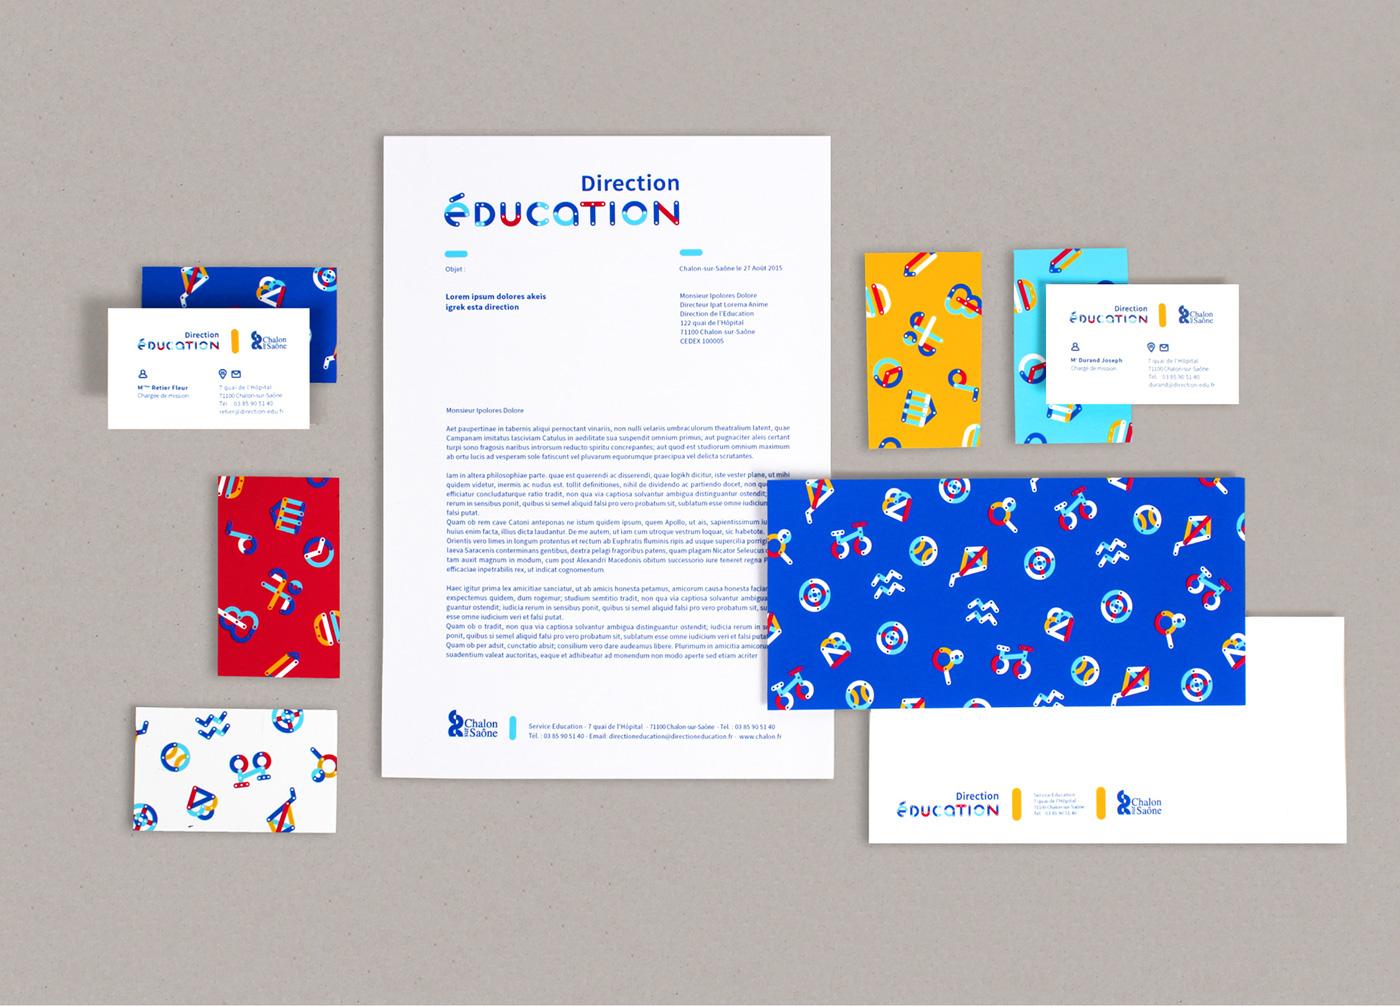 Education_4